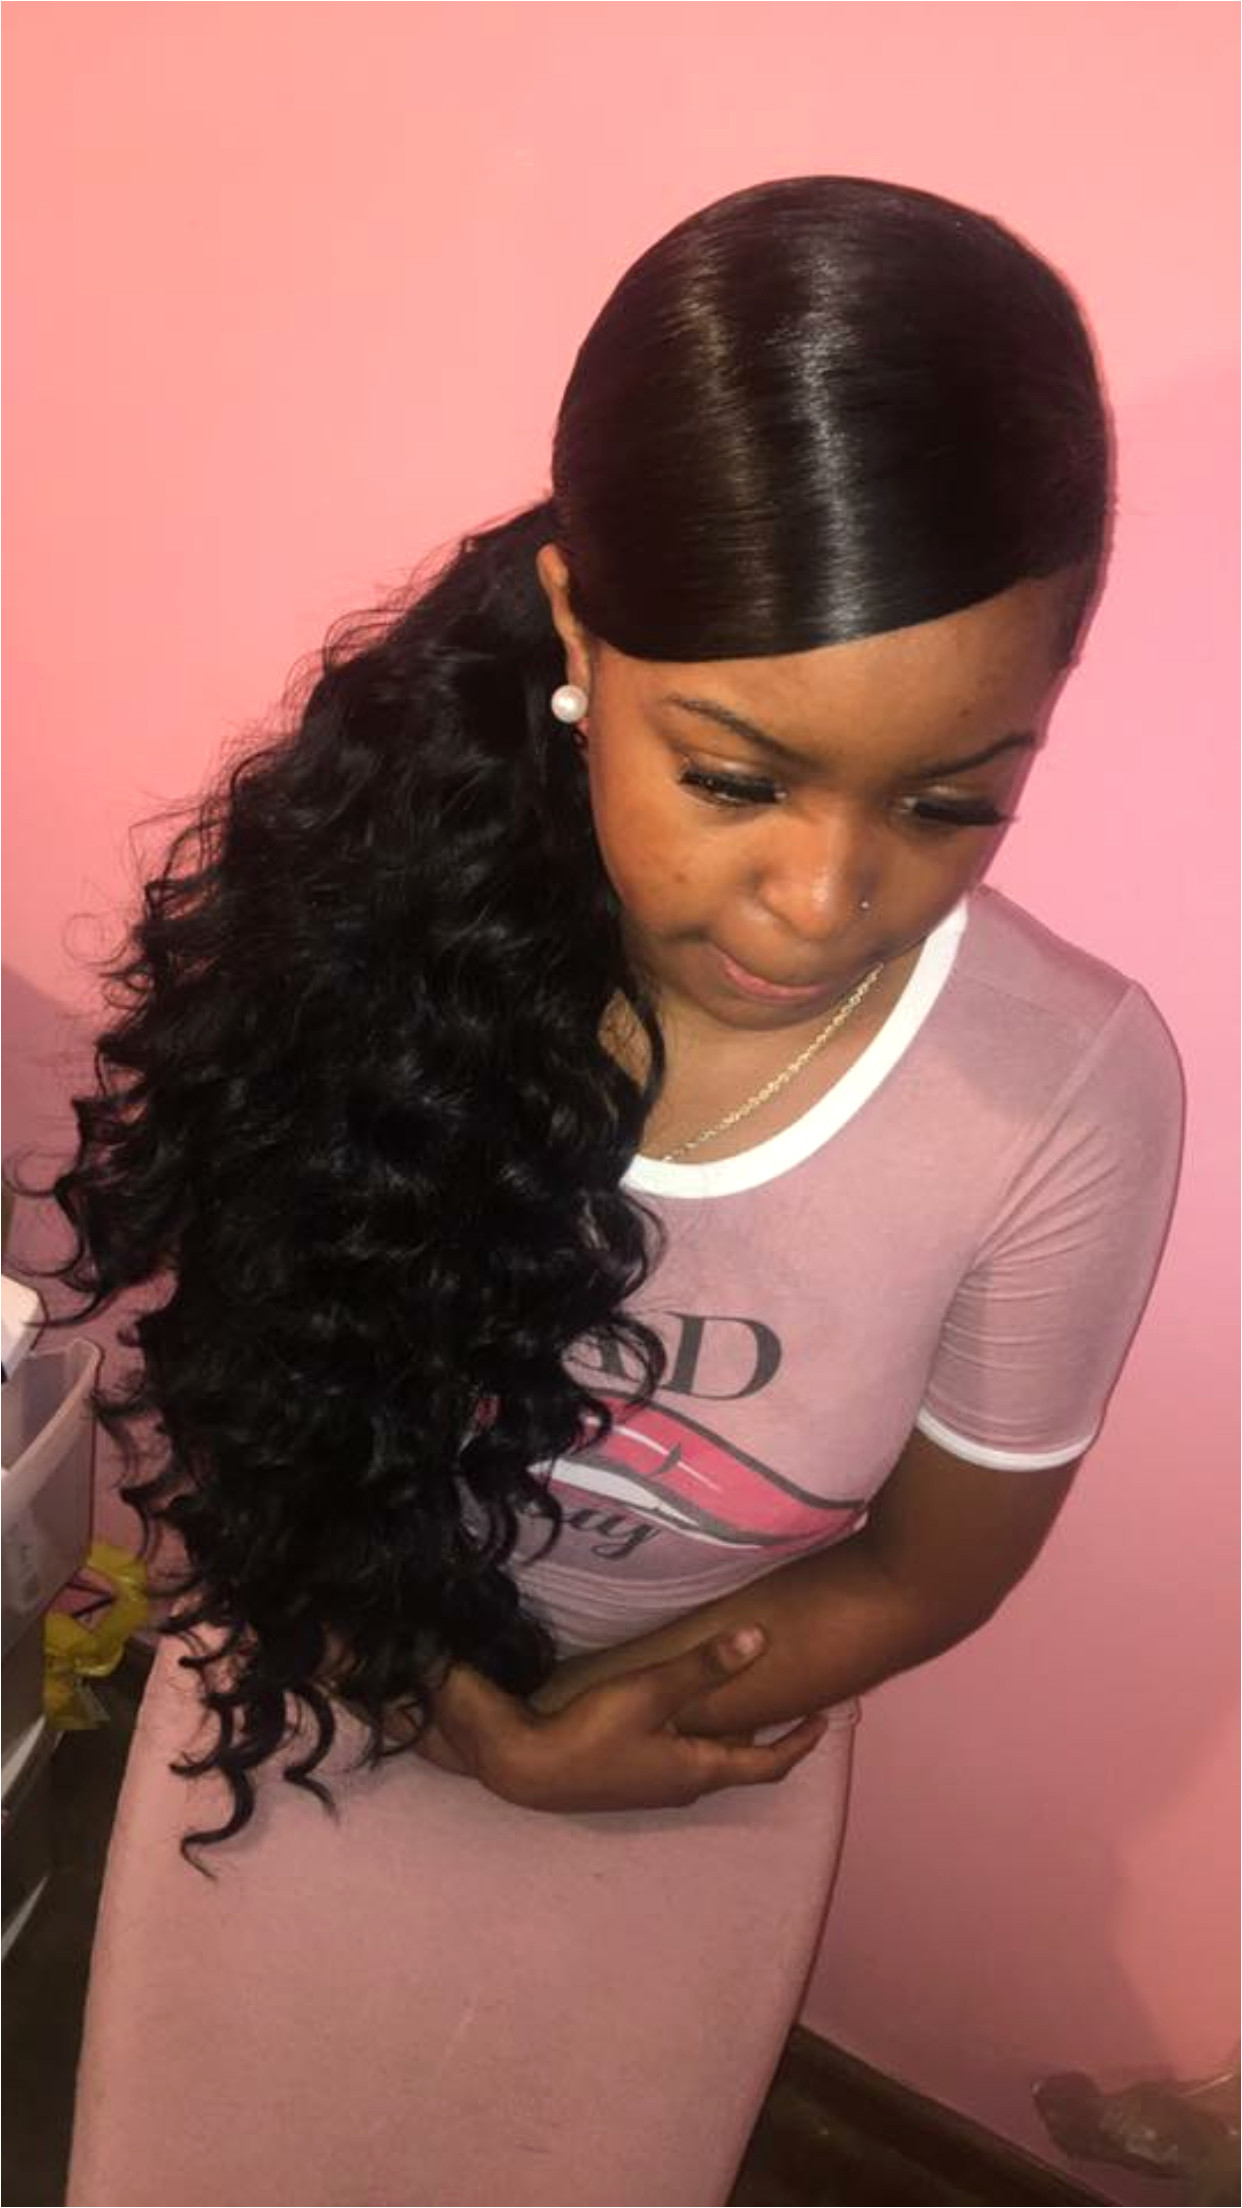 Bandana Hairstyles Short Hair Beautiful Cute Crochet Hairstyles Luxury Wowafrican Hair themes because Bangs